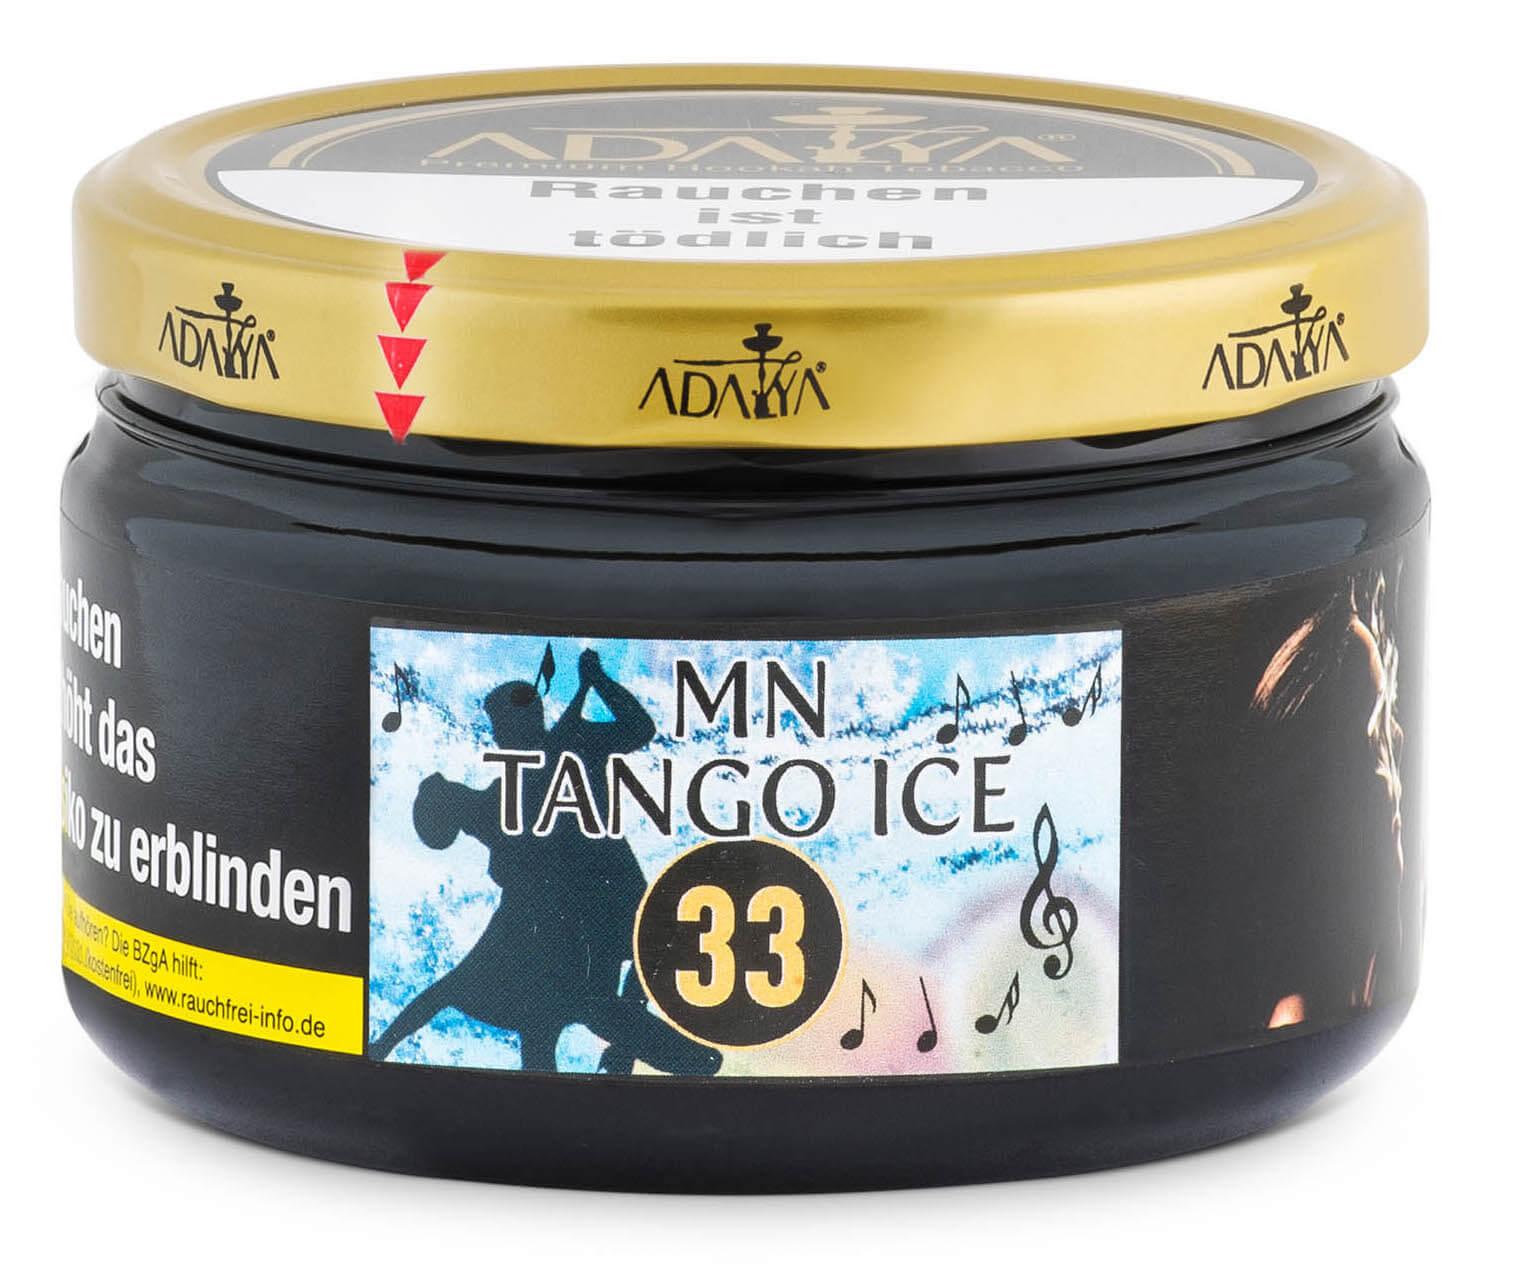 Adalya Tabak Mn Tango Ice #33 200g